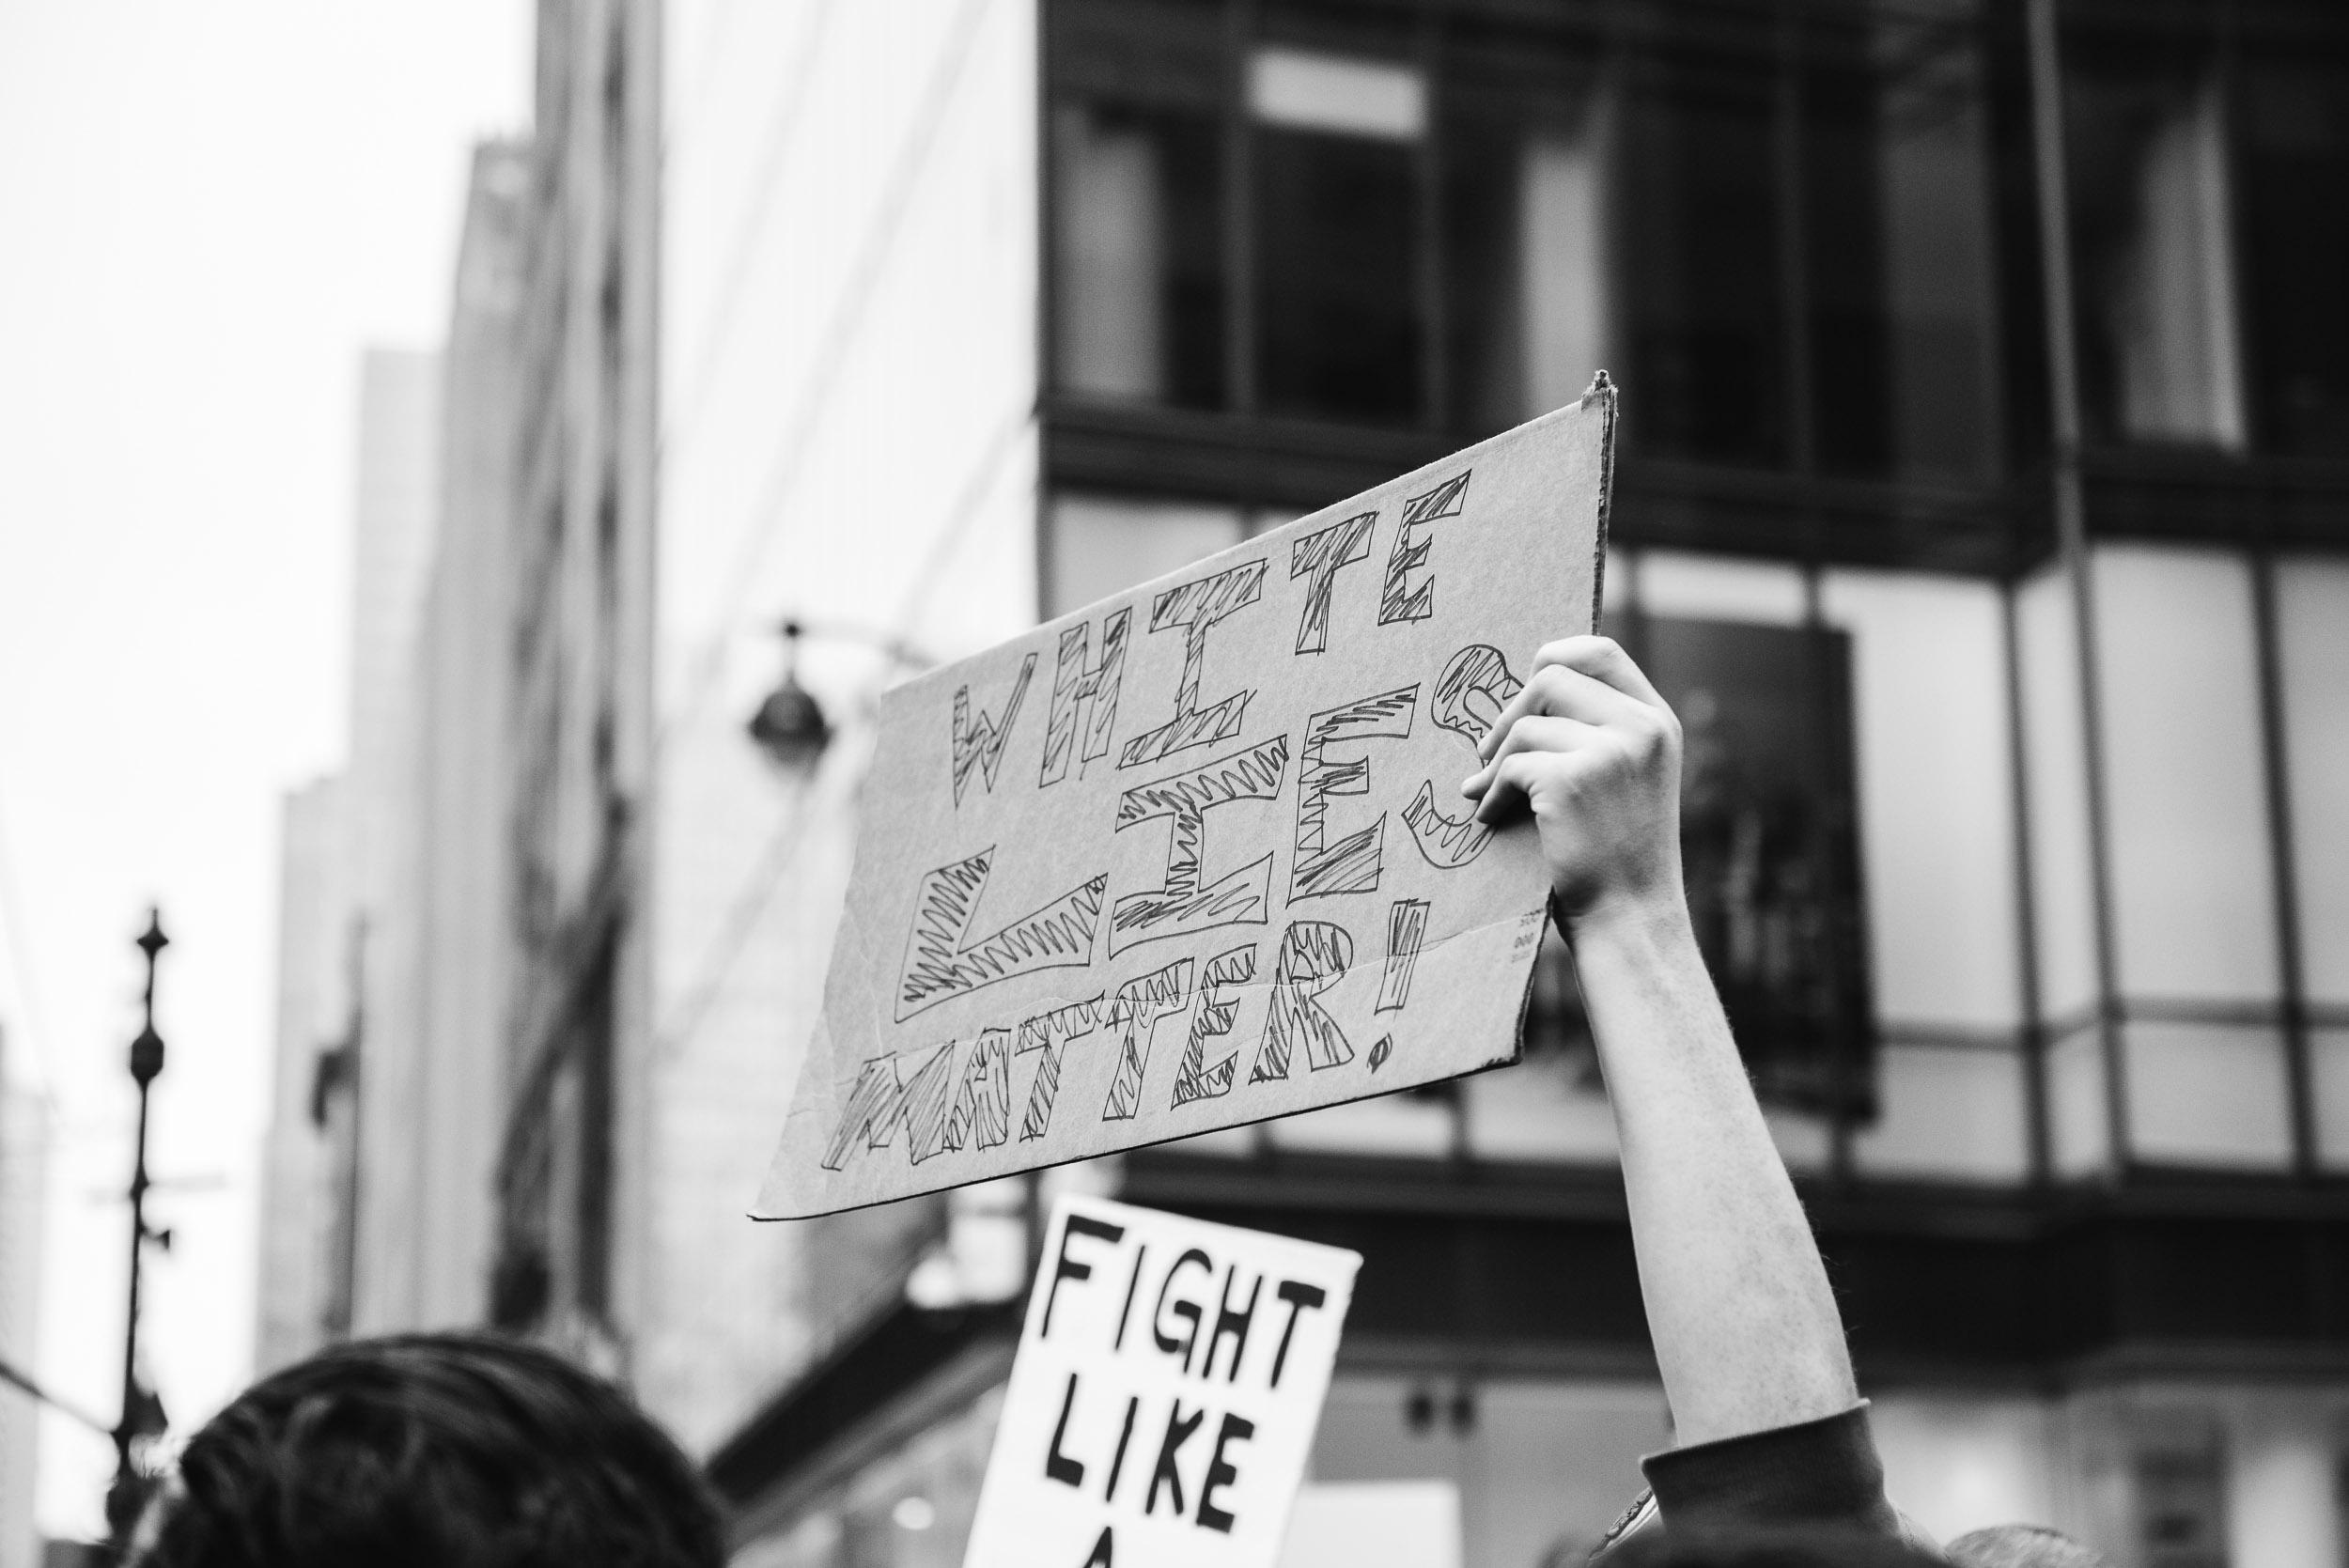 20170121 - NYC Women's March-4.jpg